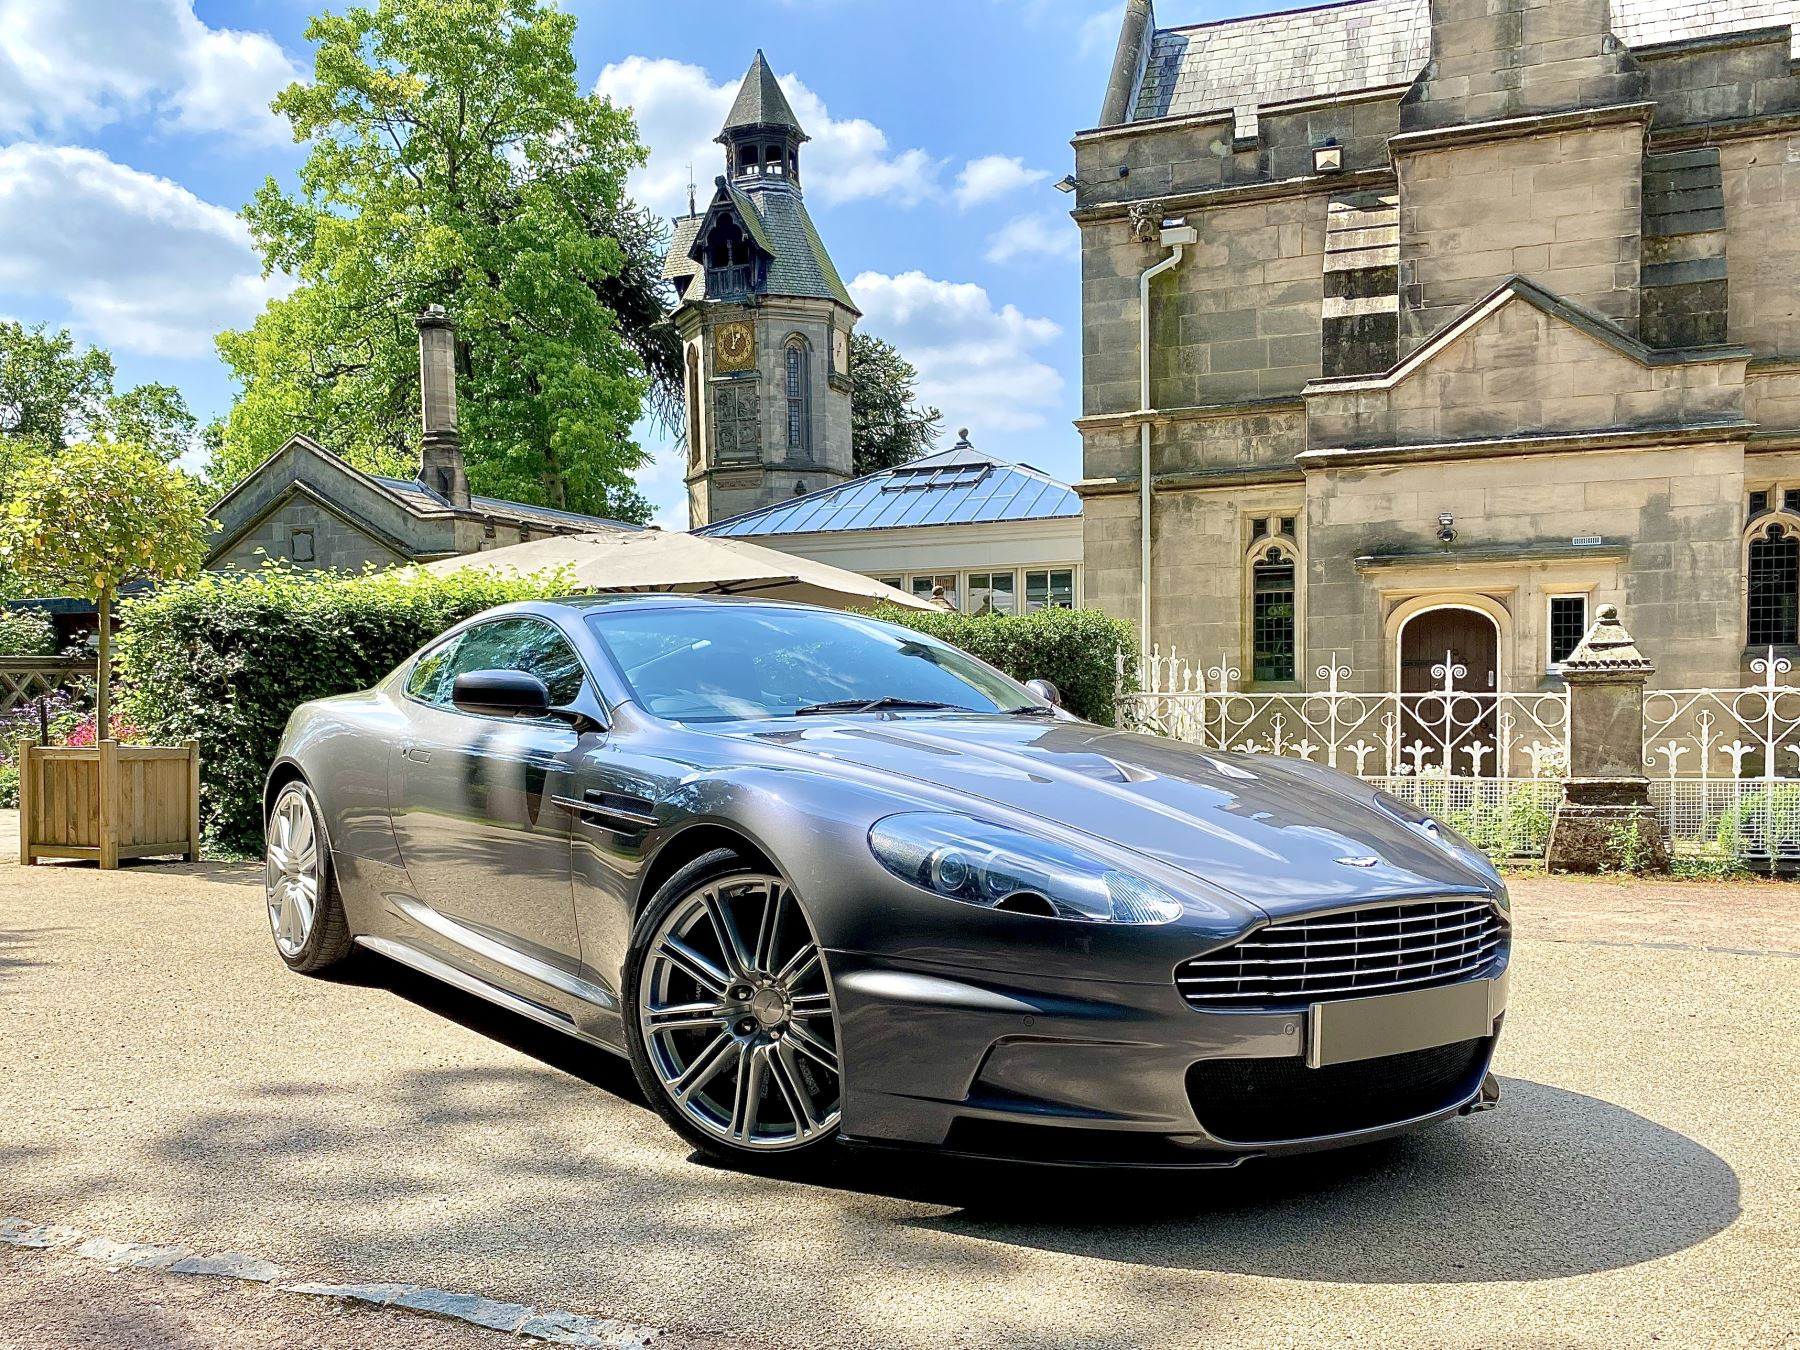 Aston Martin DBS V12 2dr image 1